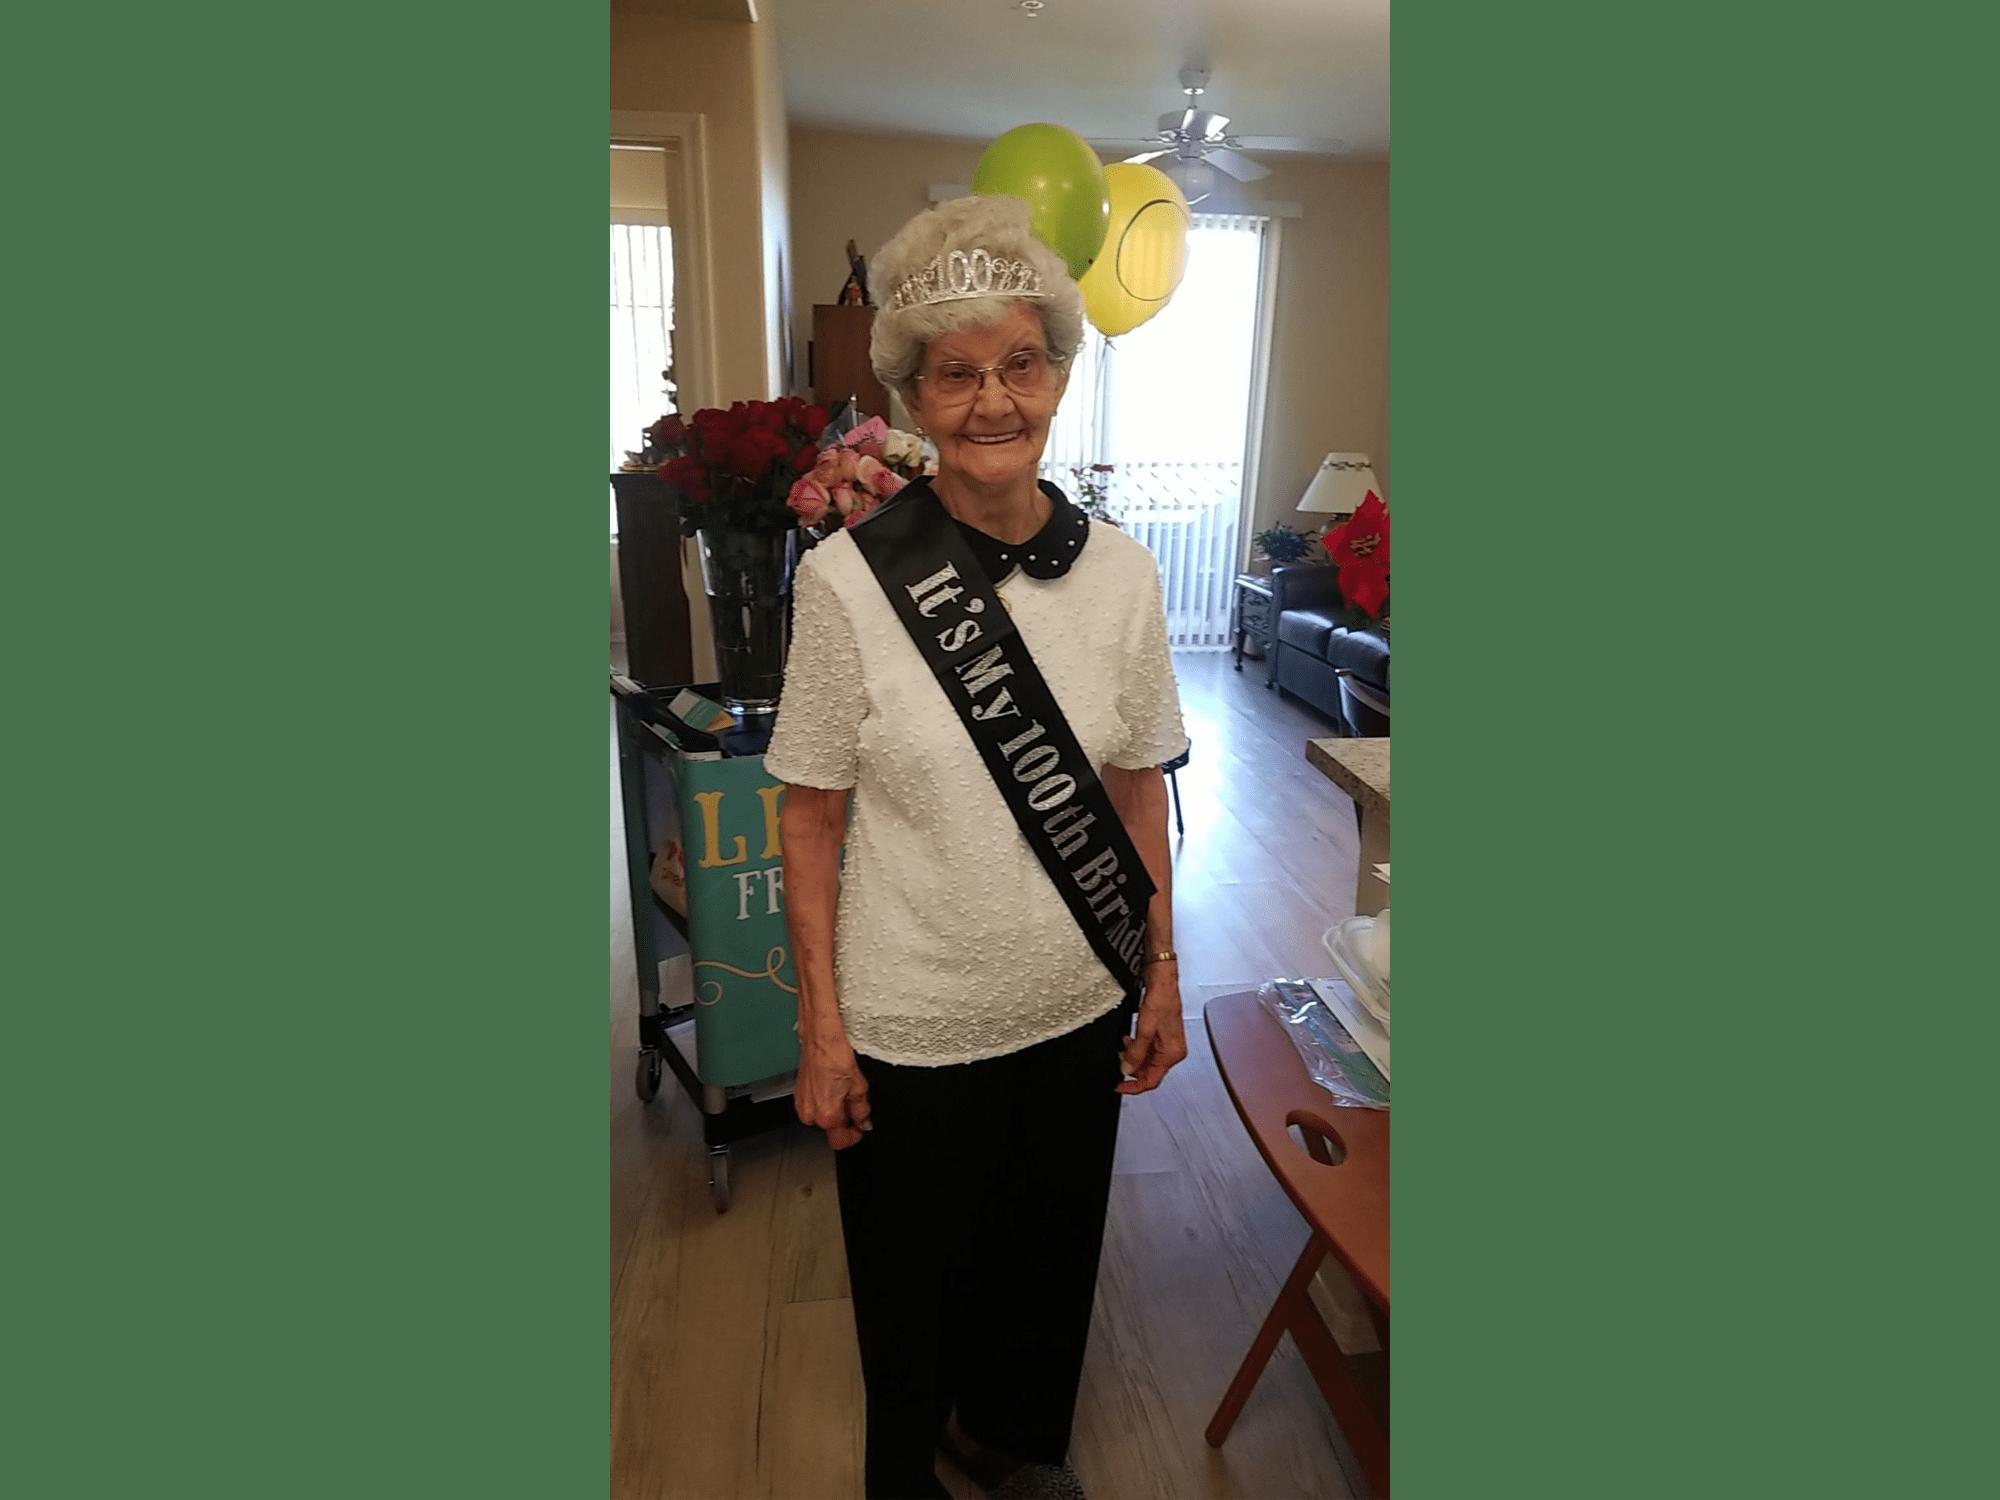 A resident's birthday at McDowell Village in Scottsdale, Arizona